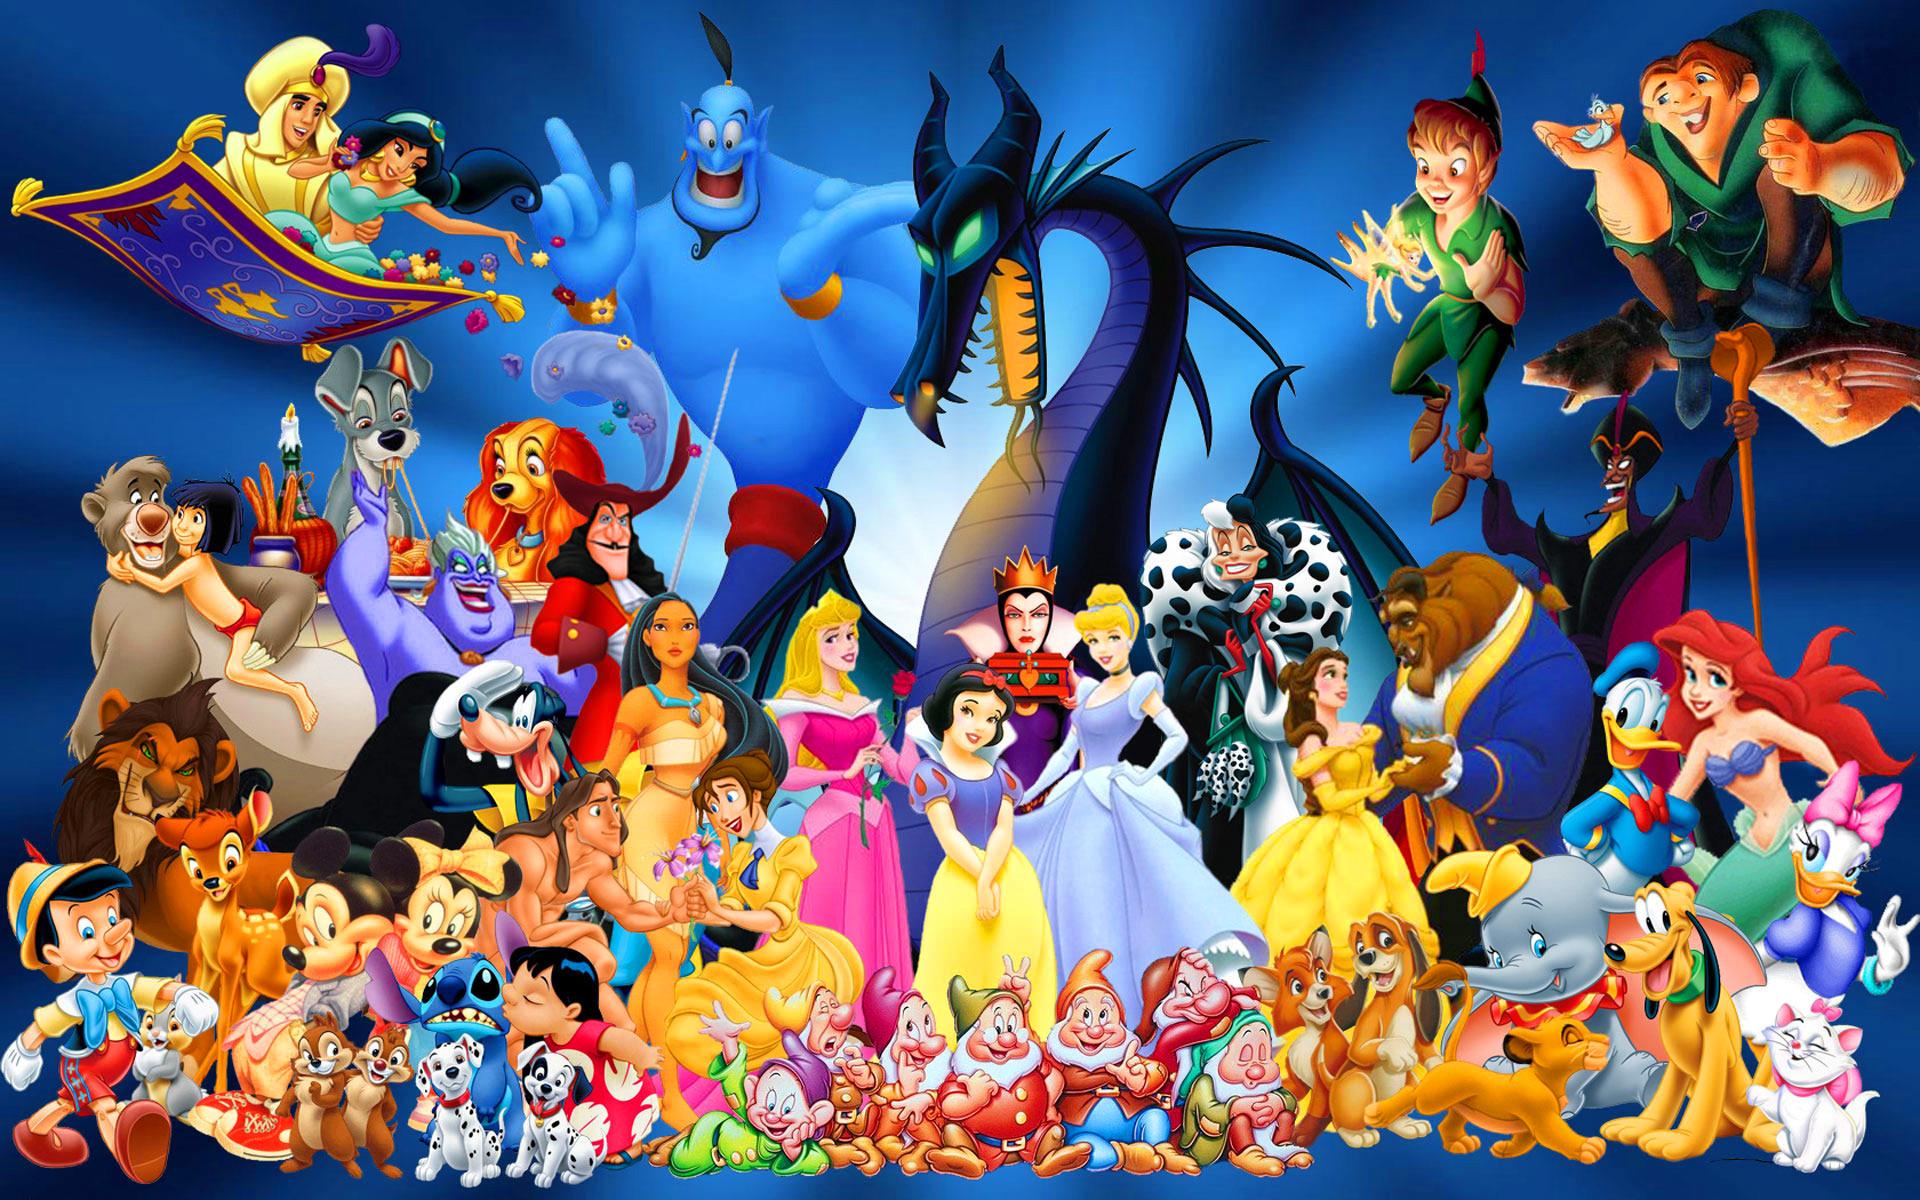 Wallpaper Disney Cartoon 1920x1200